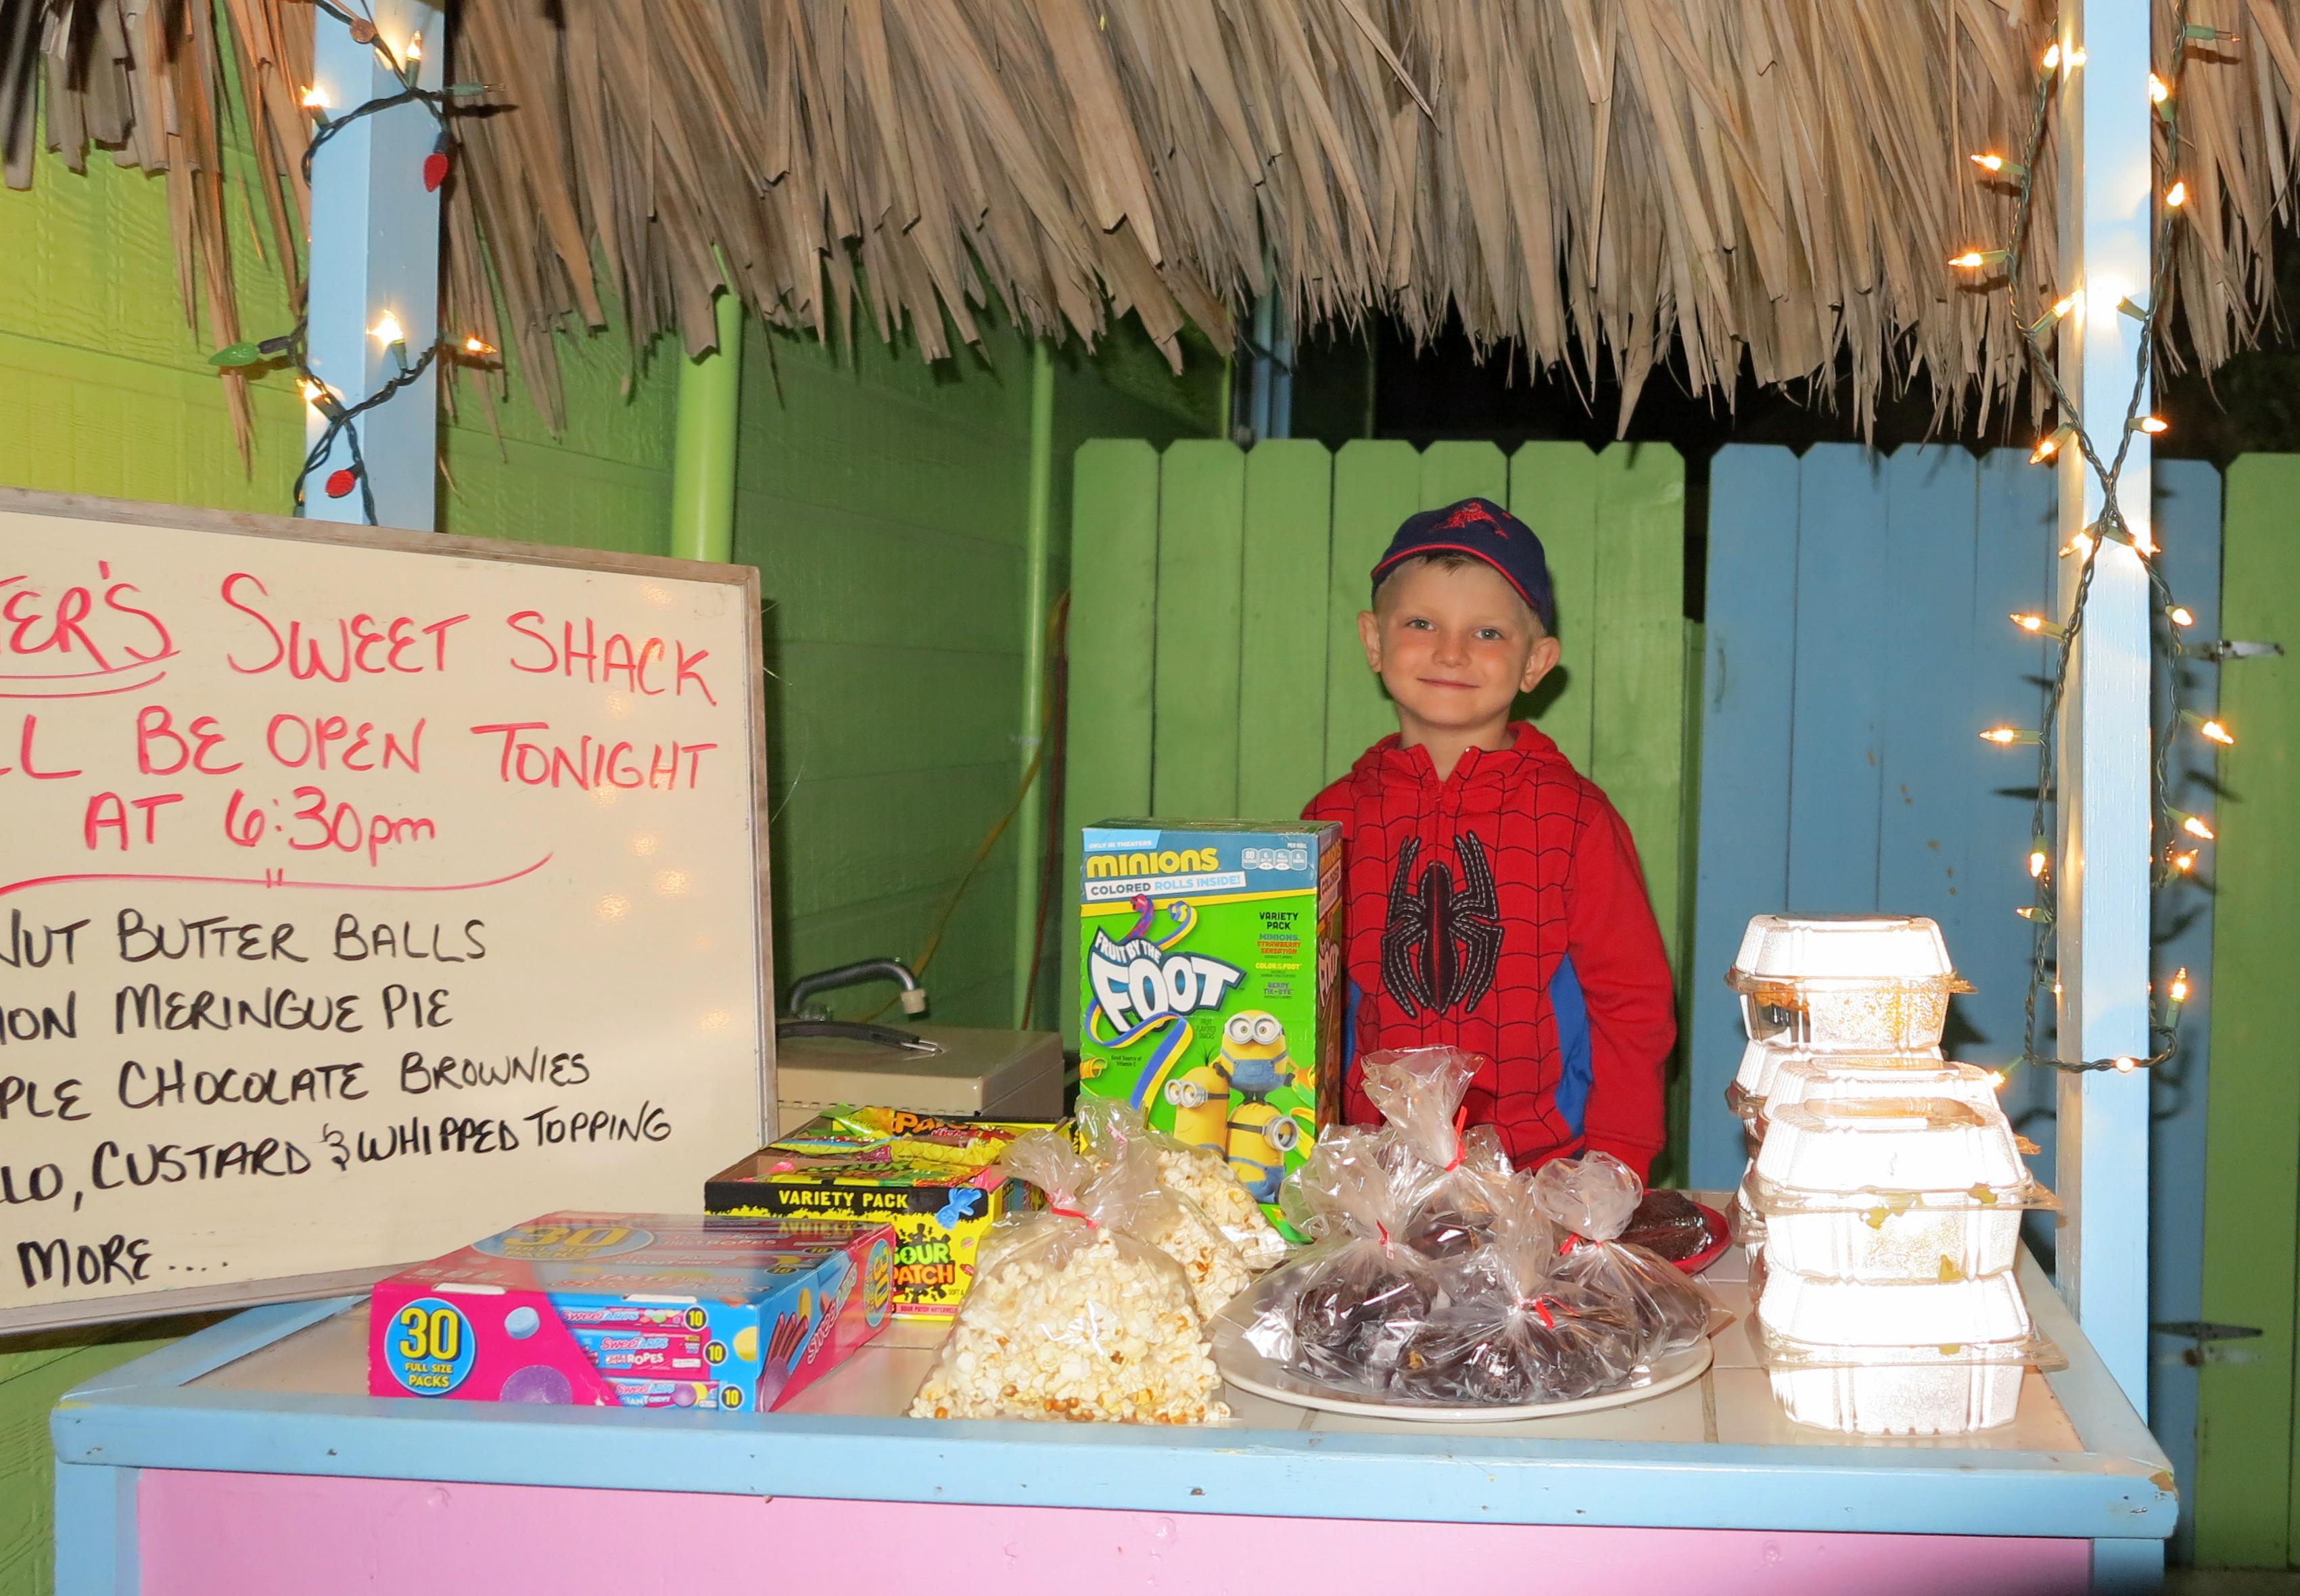 Abaco's Most Adorable Entrepreneur, Carter Farrington, who operates Carter's Sweet Shack on Green Turtle Cay.